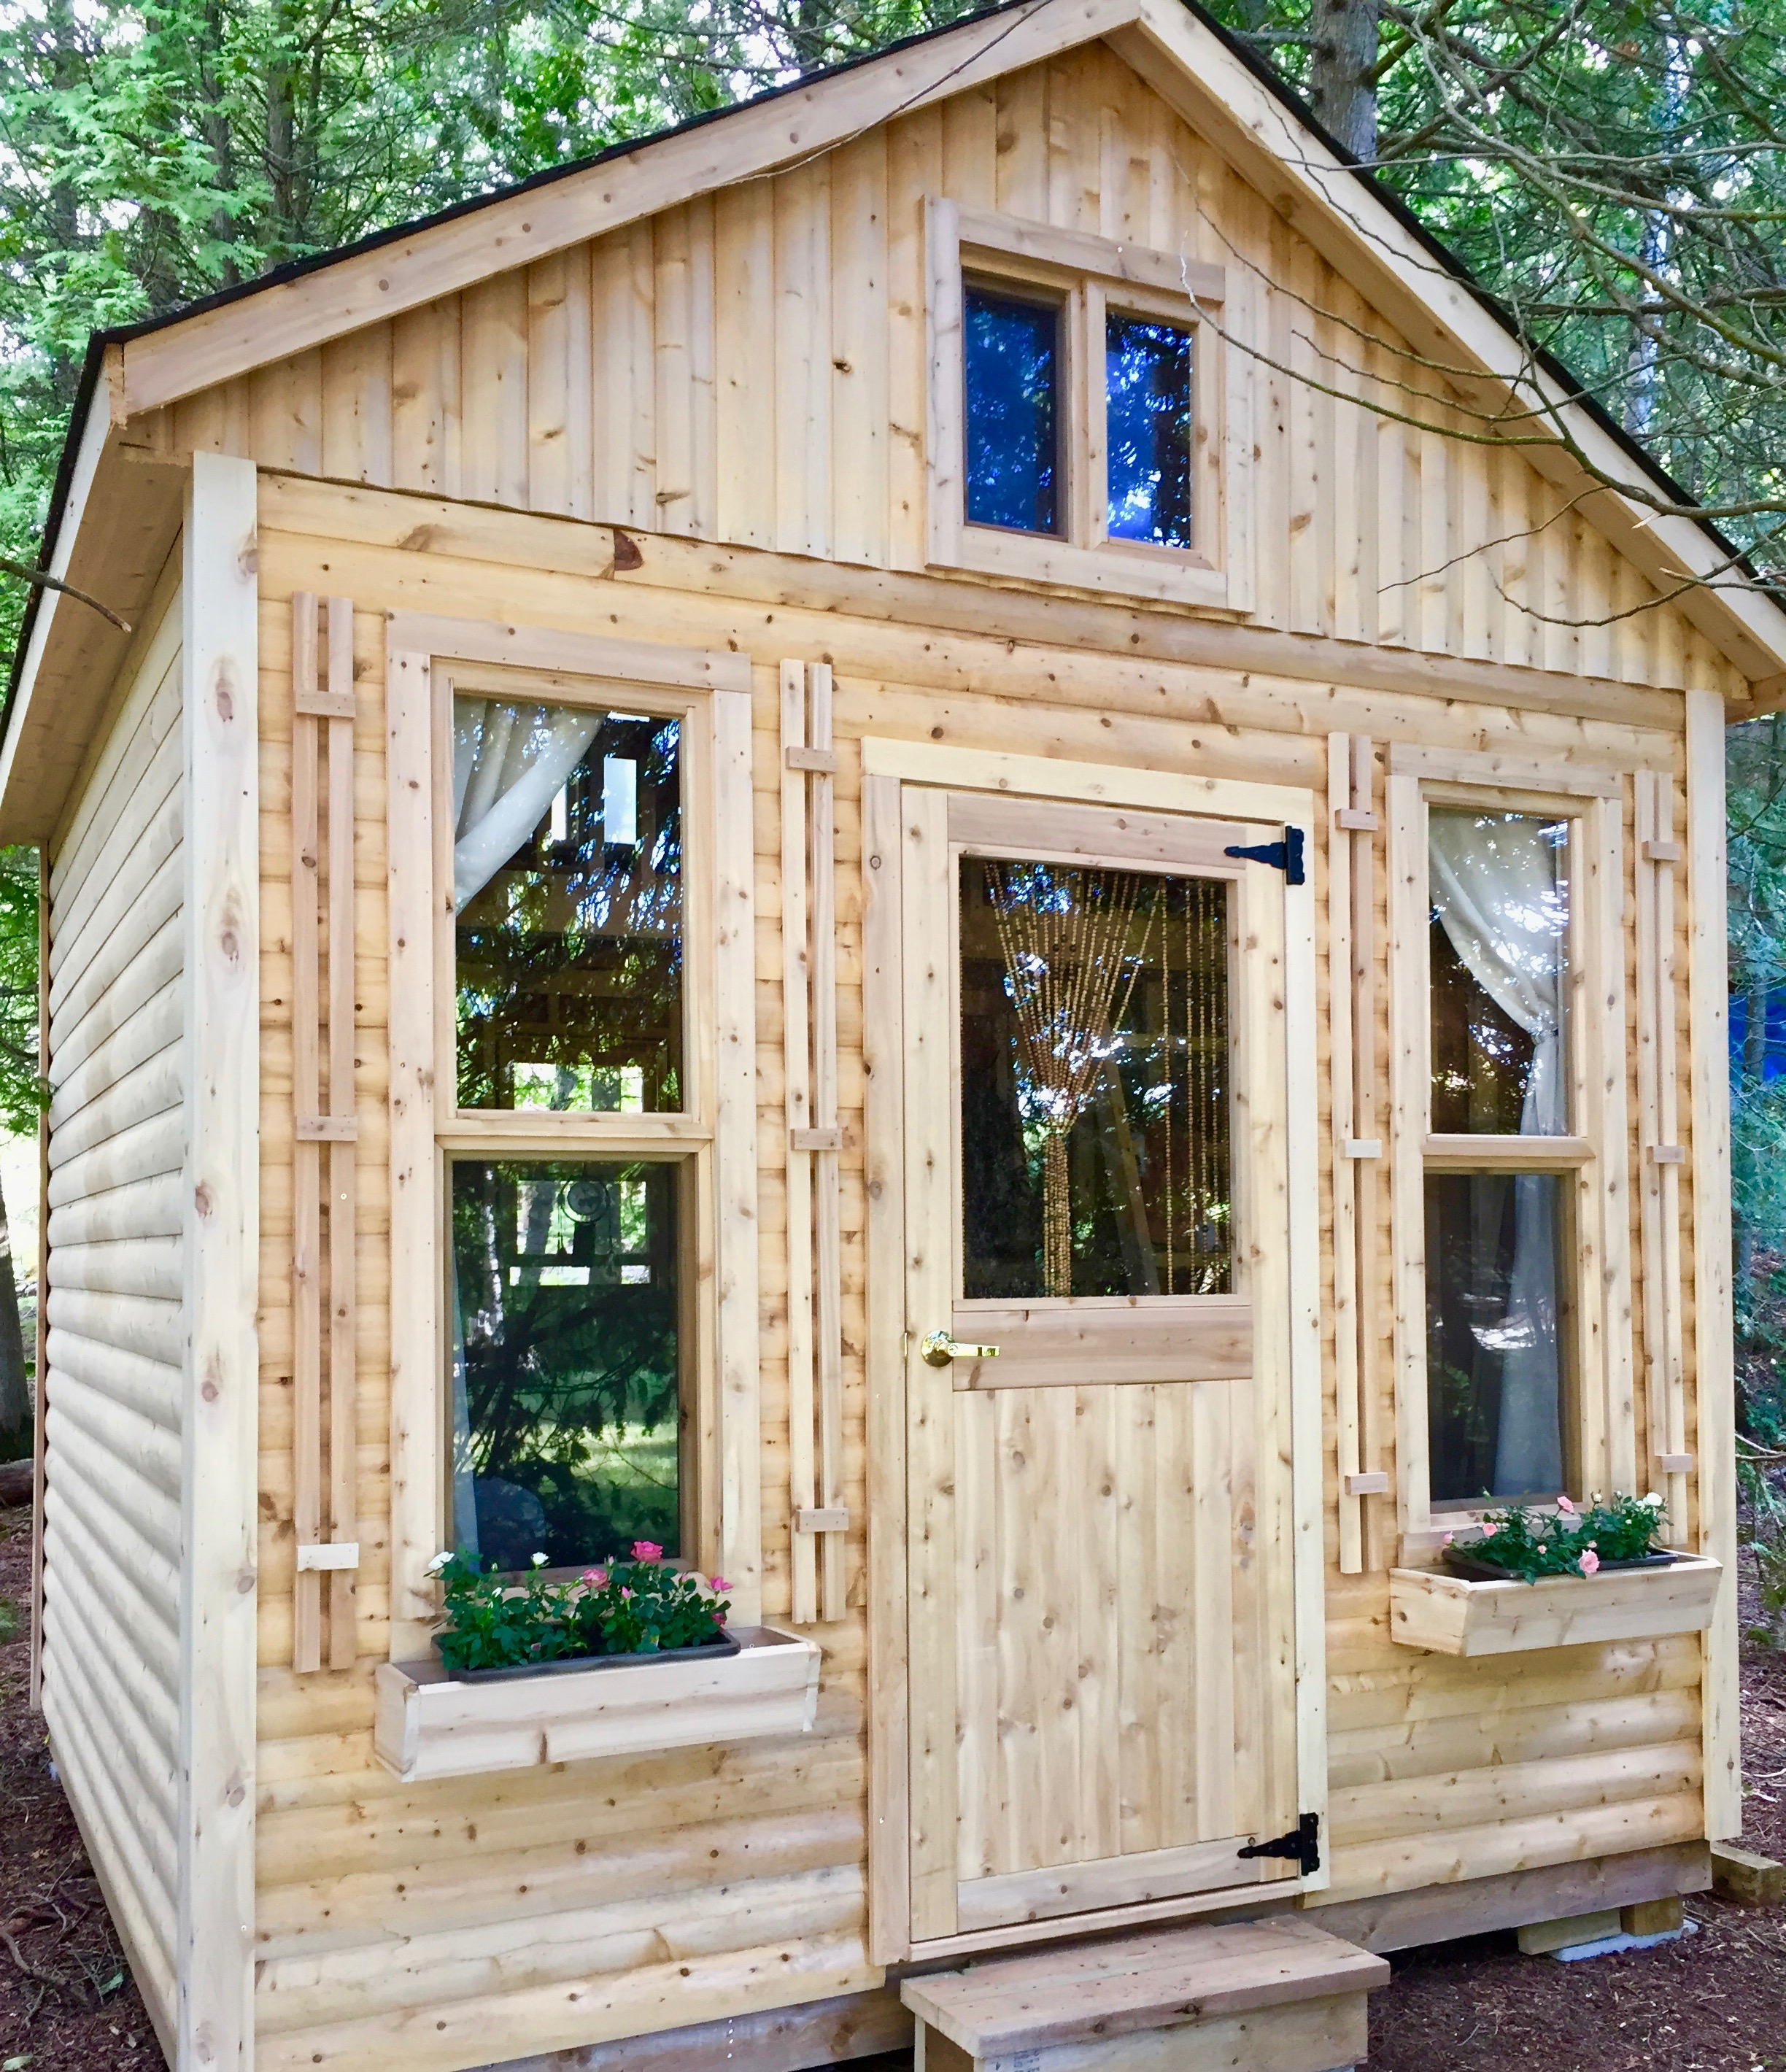 Cabin in the woods 2 2.jpg